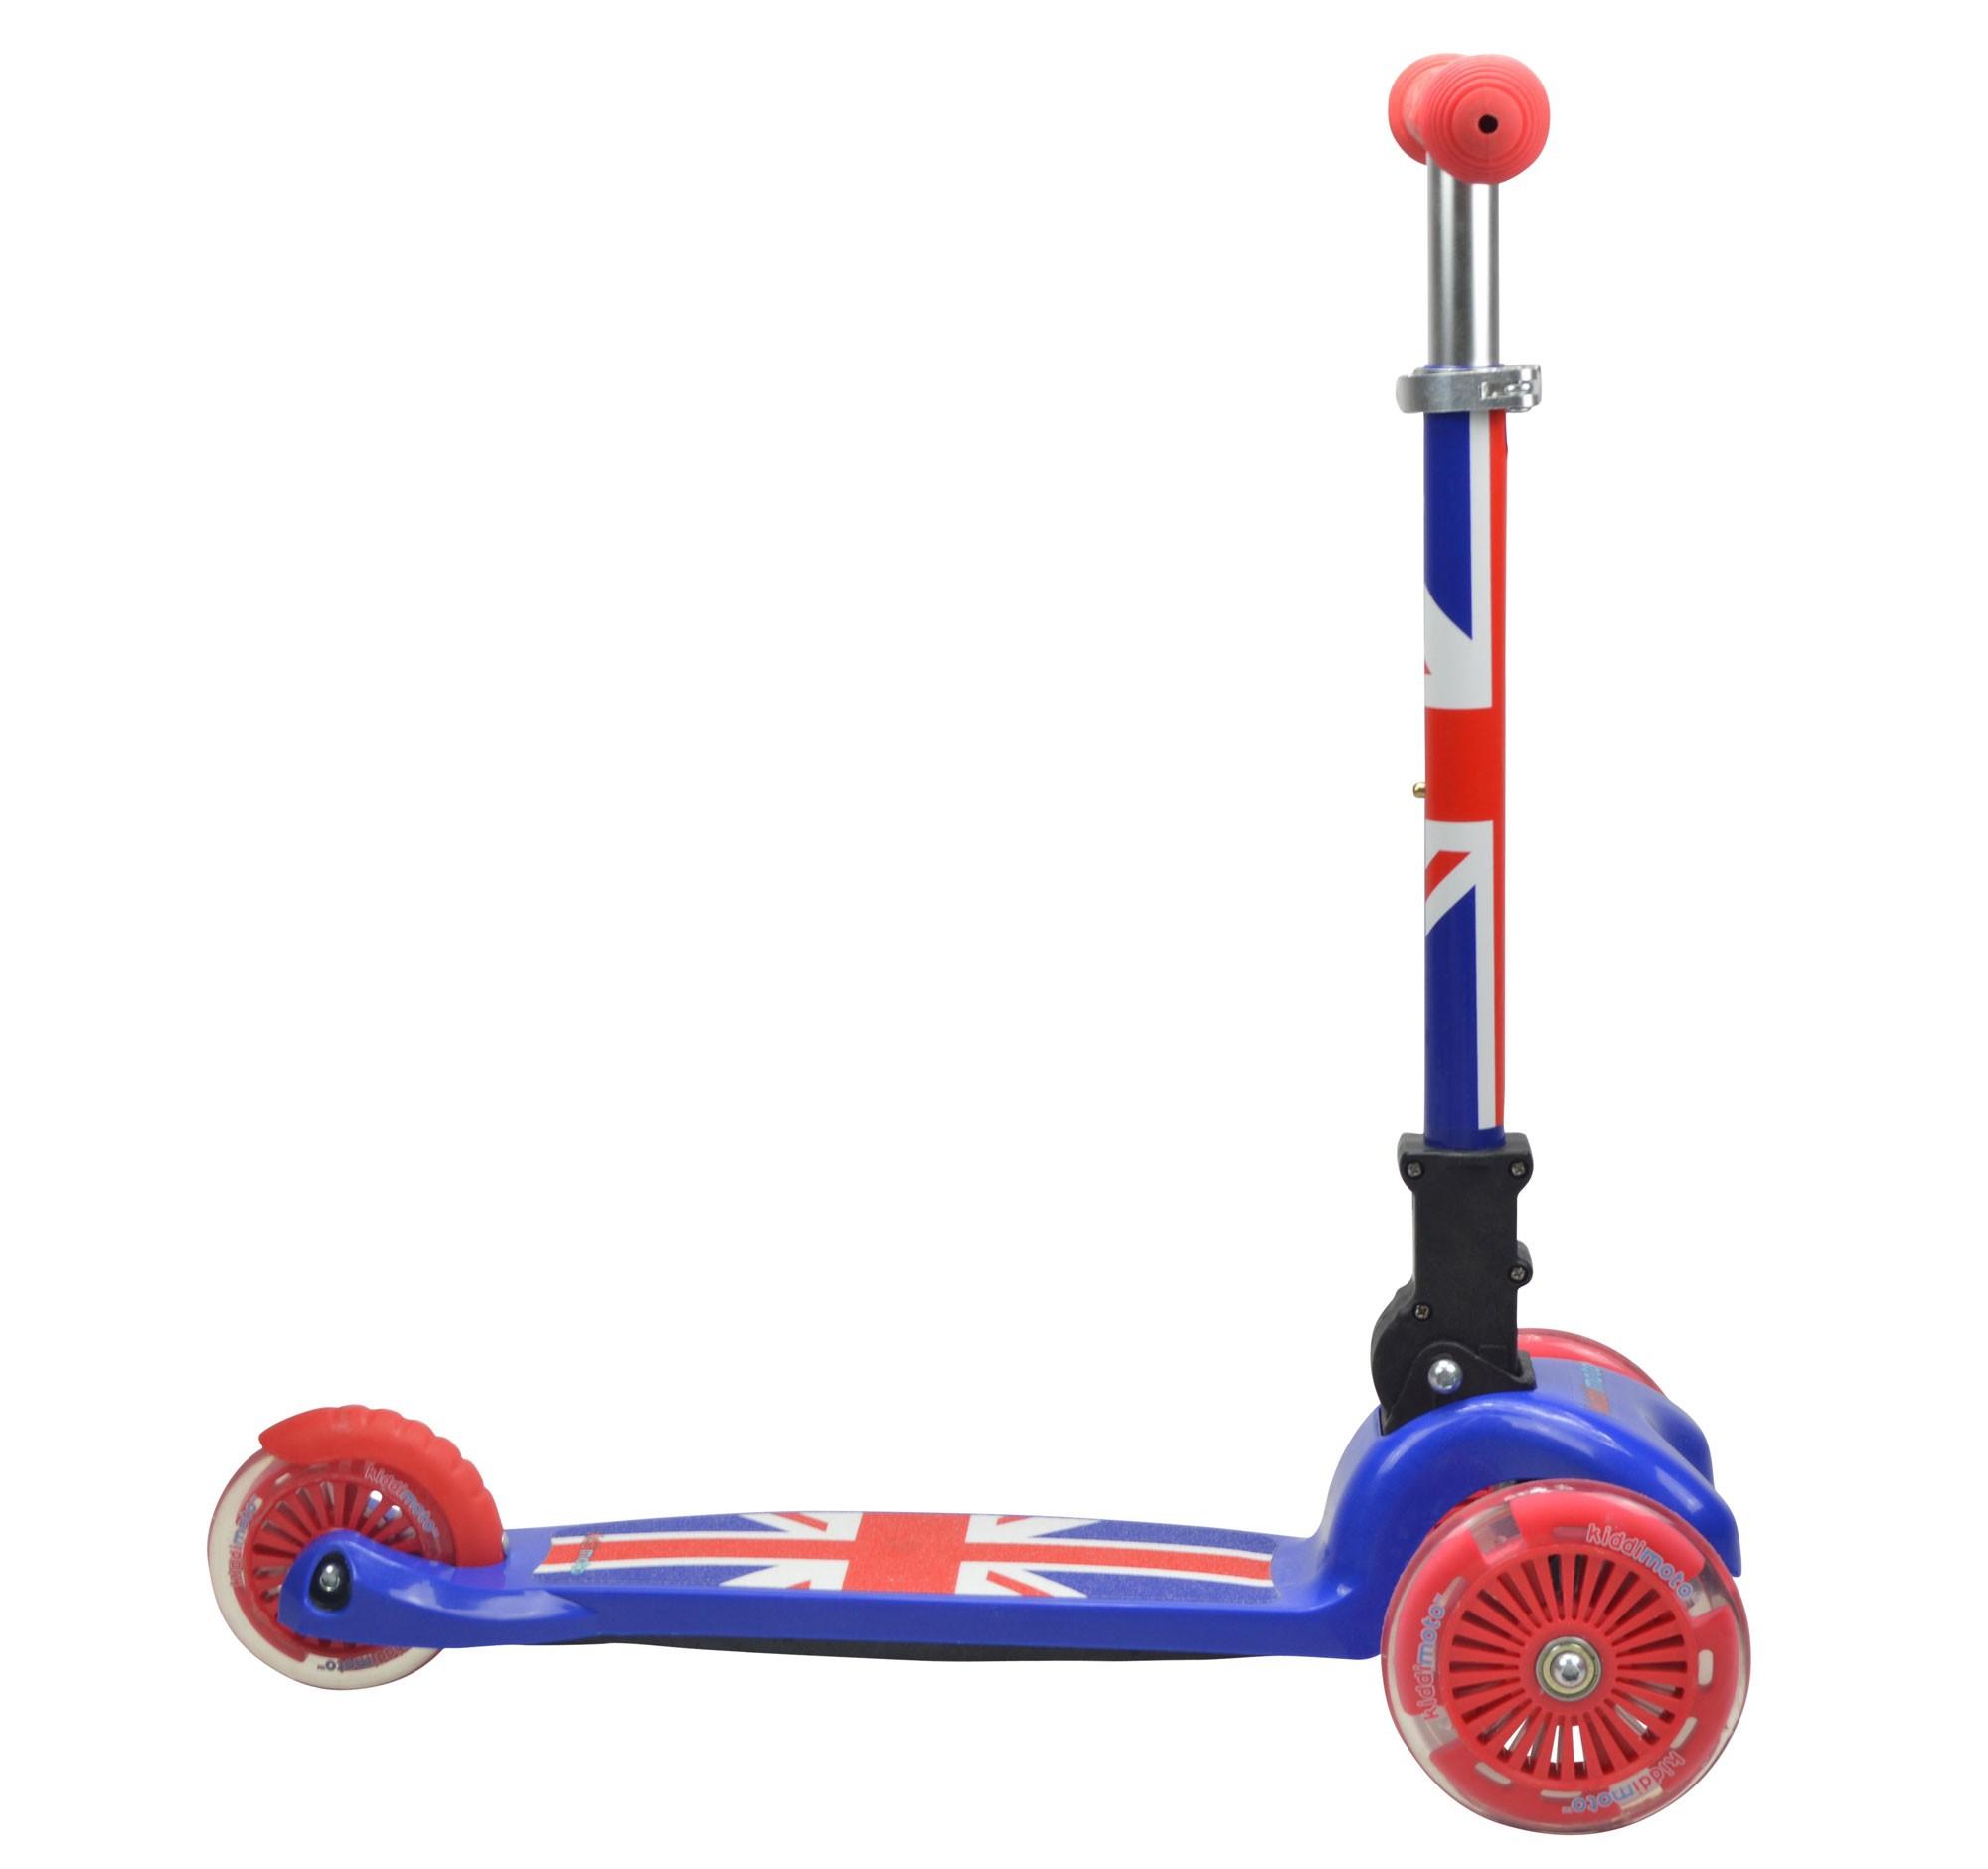 kiddimoto Scooter / Kinderroller U-Zoom Scooter klappbar Union Jack Bild 2